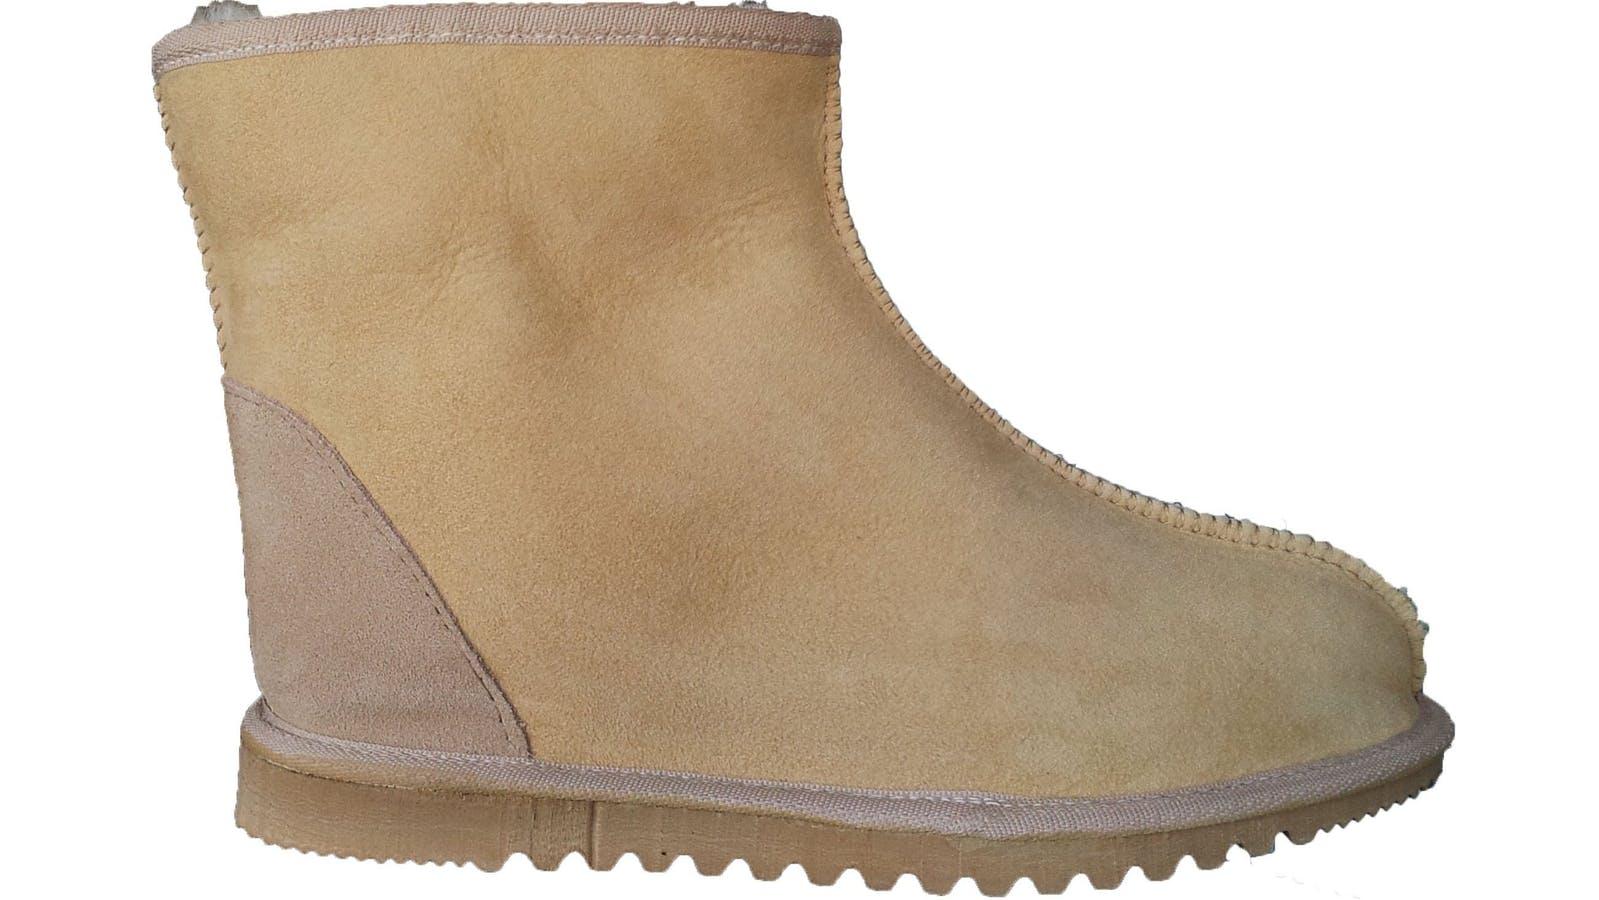 Sheepskin Ugg Boots - 1/4 Length